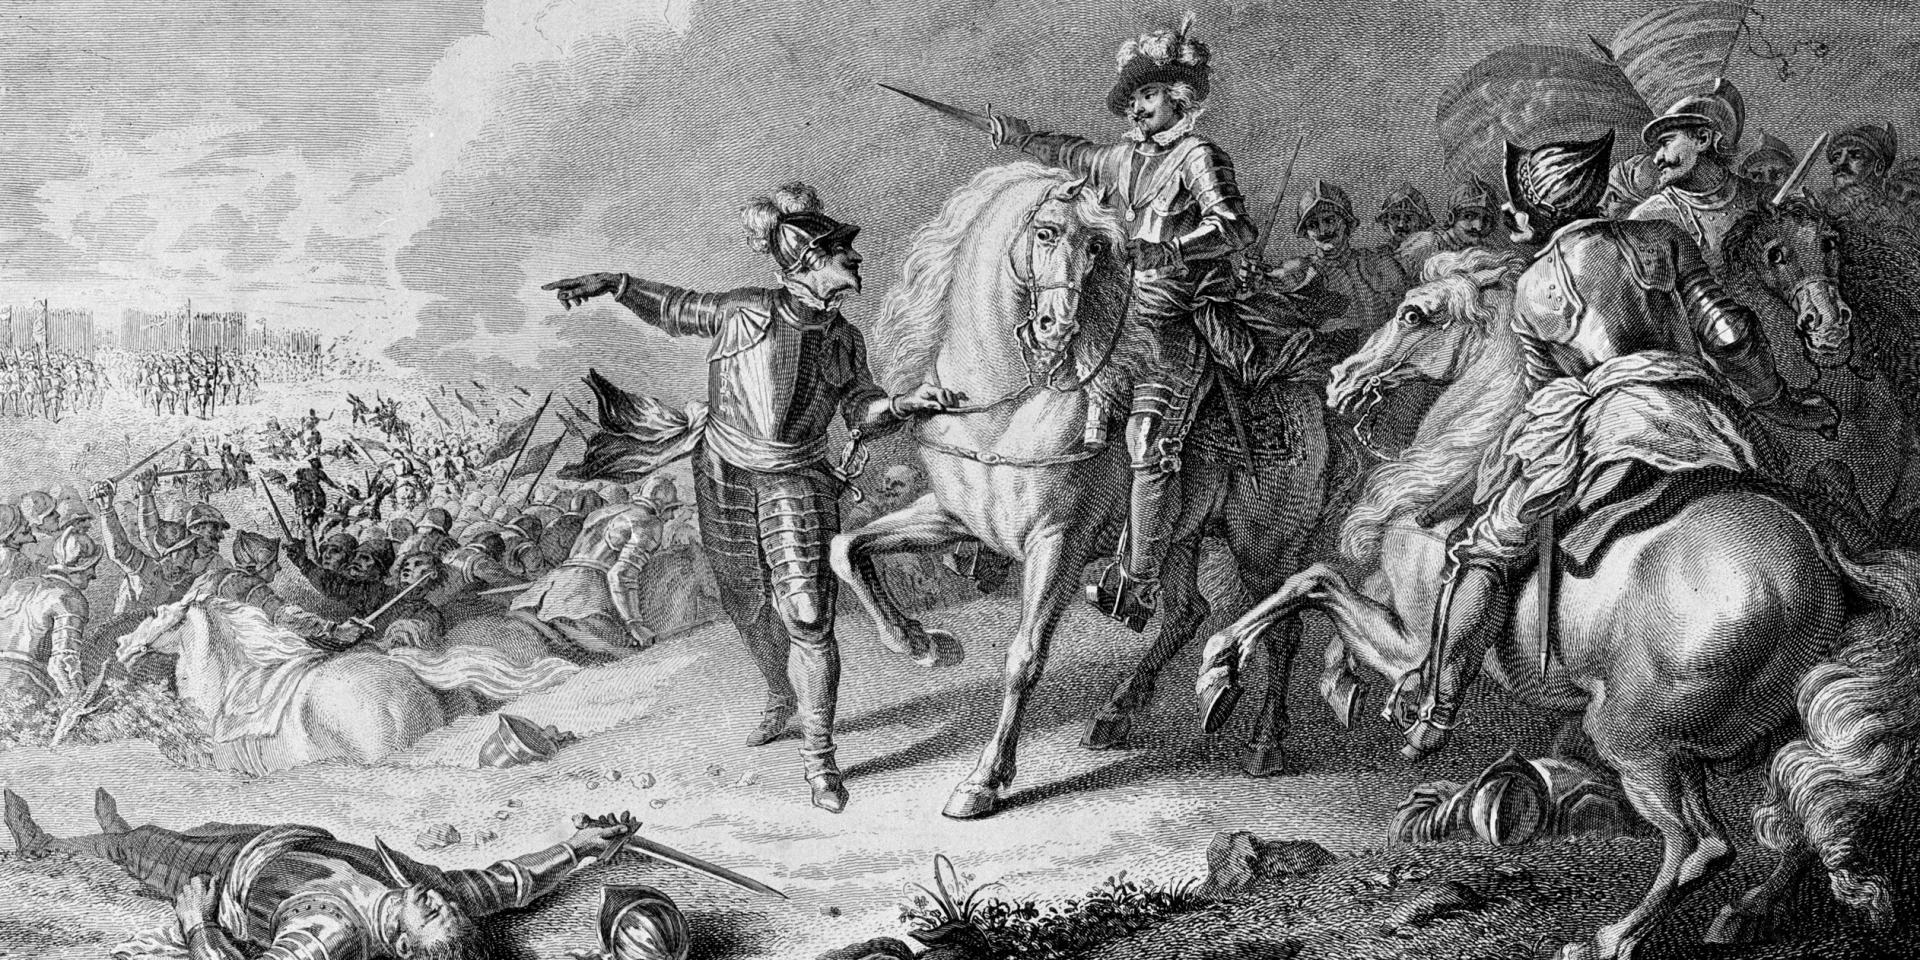 The Battle of Naseby, 14 June 1645